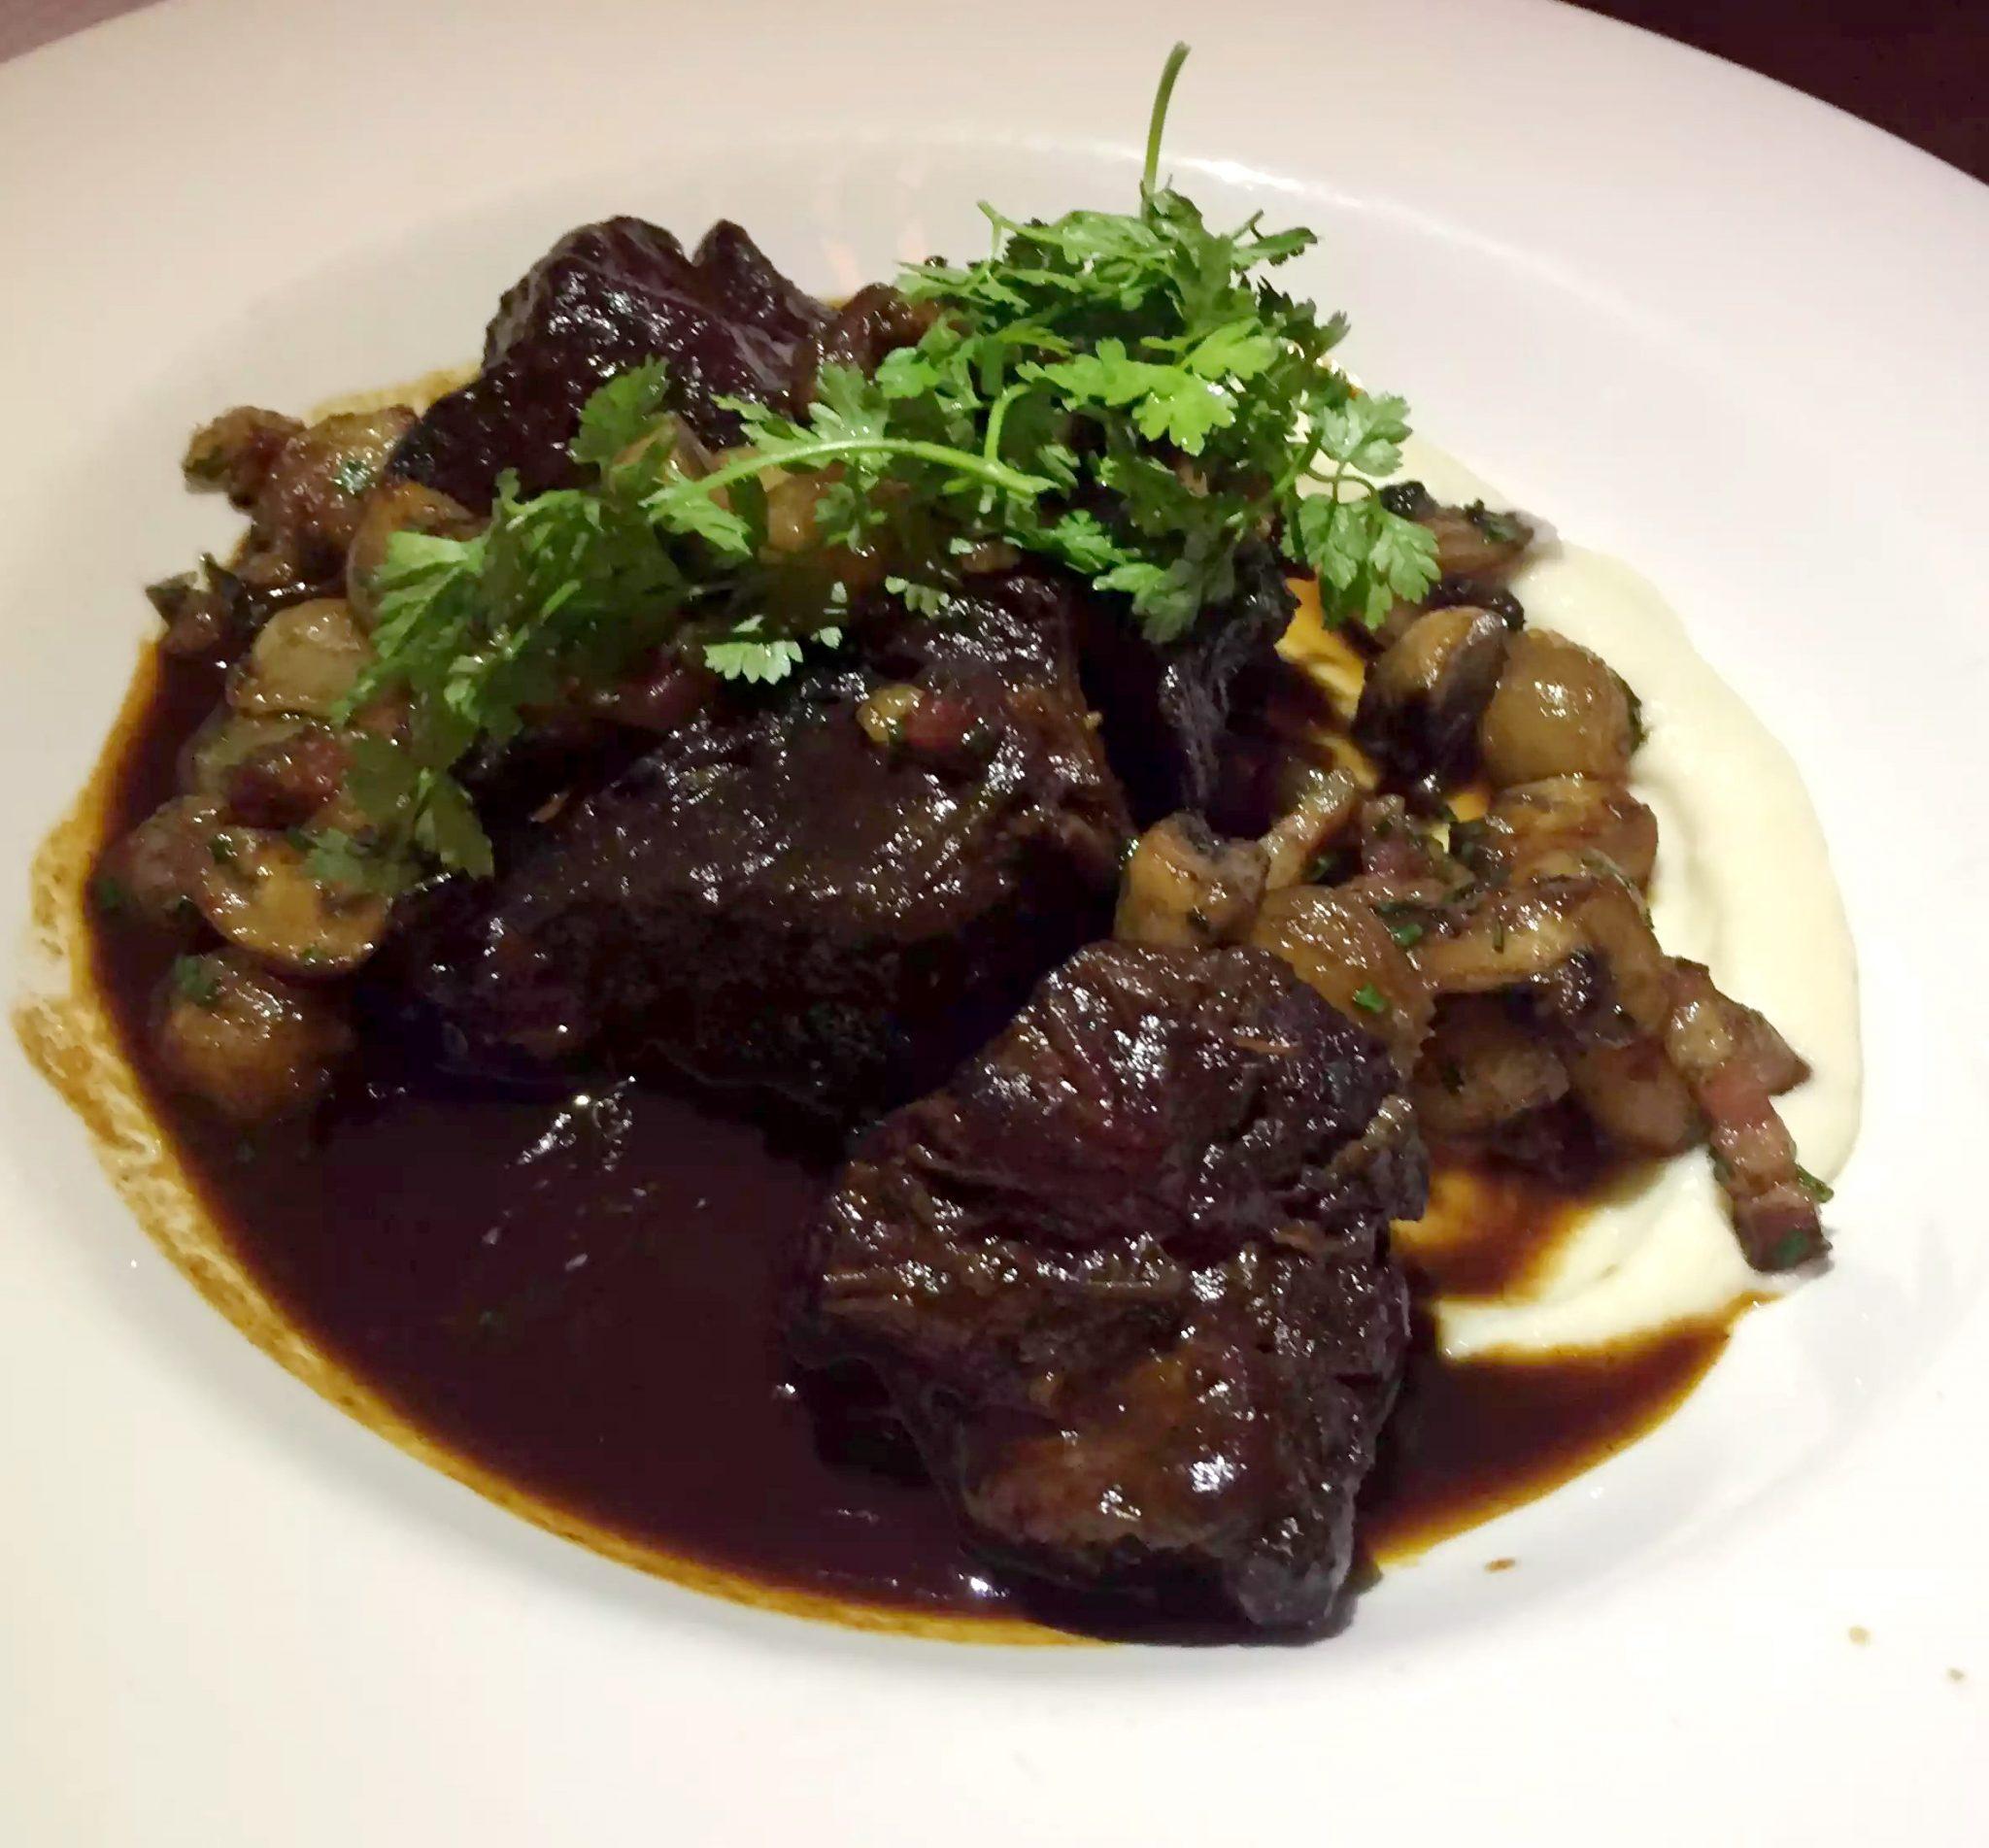 Balthazar Restaurant Covent Garden, London Ox cHEEK bourguignon